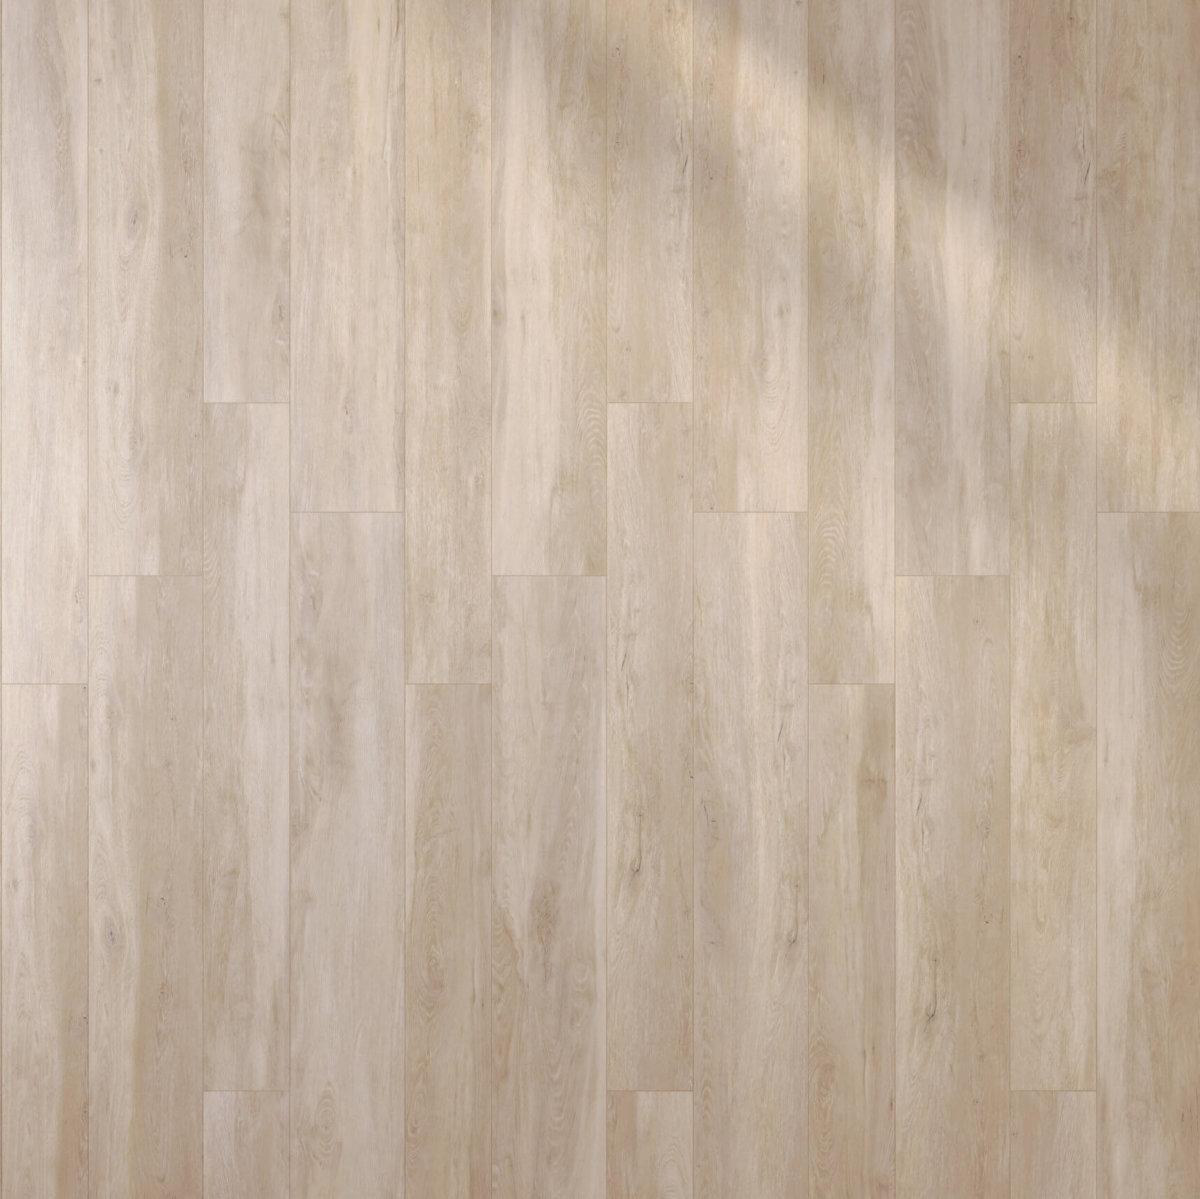 Woodtime Larice Natural Rett 200x1200mm_Stiles_Product2_Image